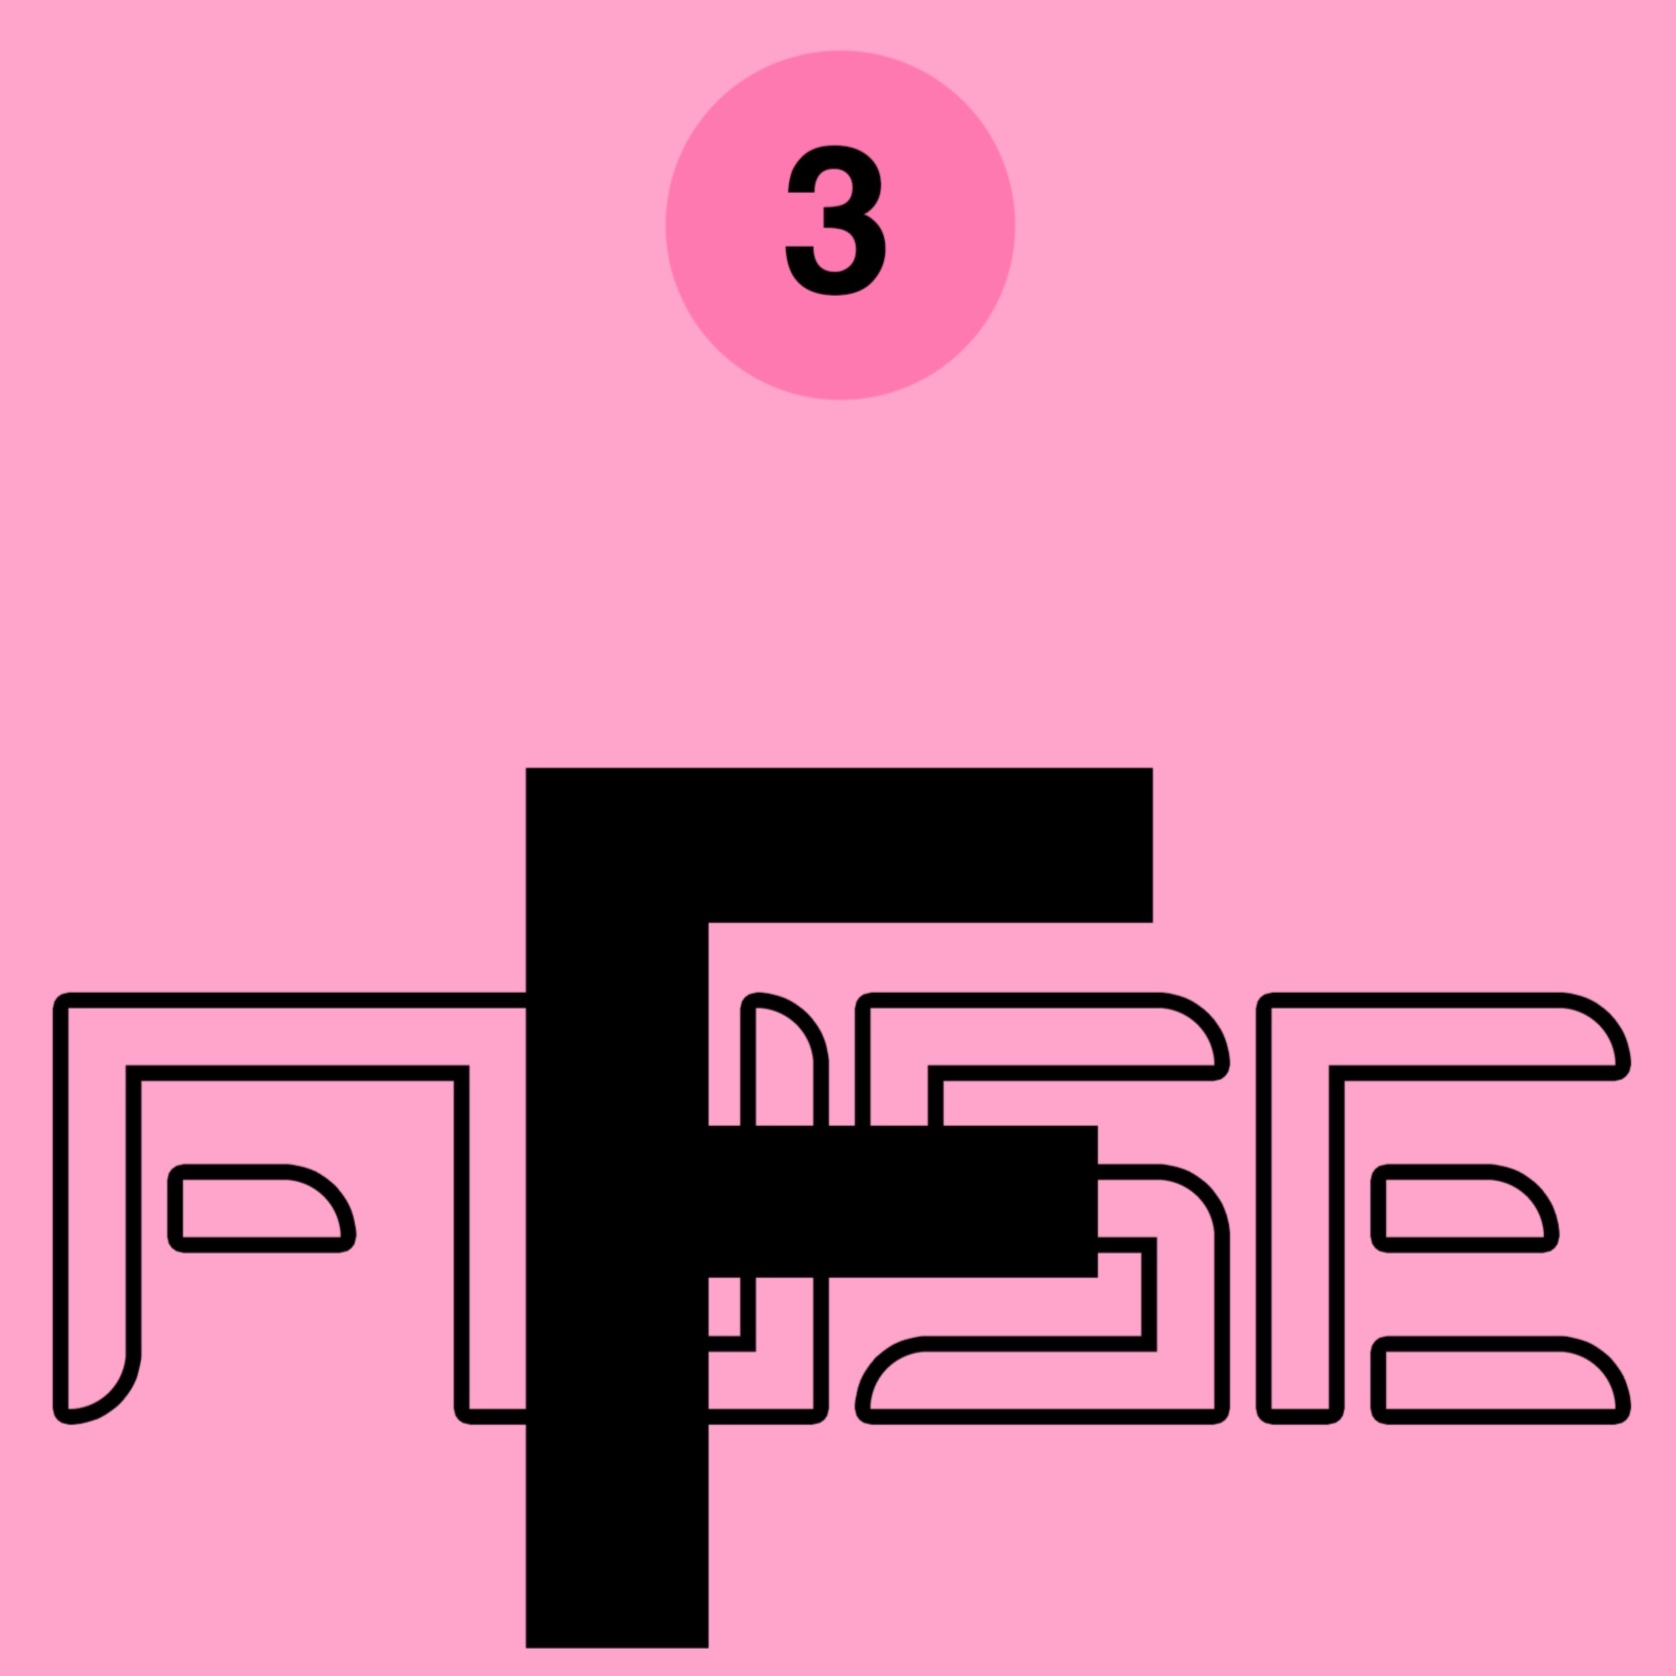 FUSE%2Bv3%2Bflyer%2Bpink%2B2.jpg